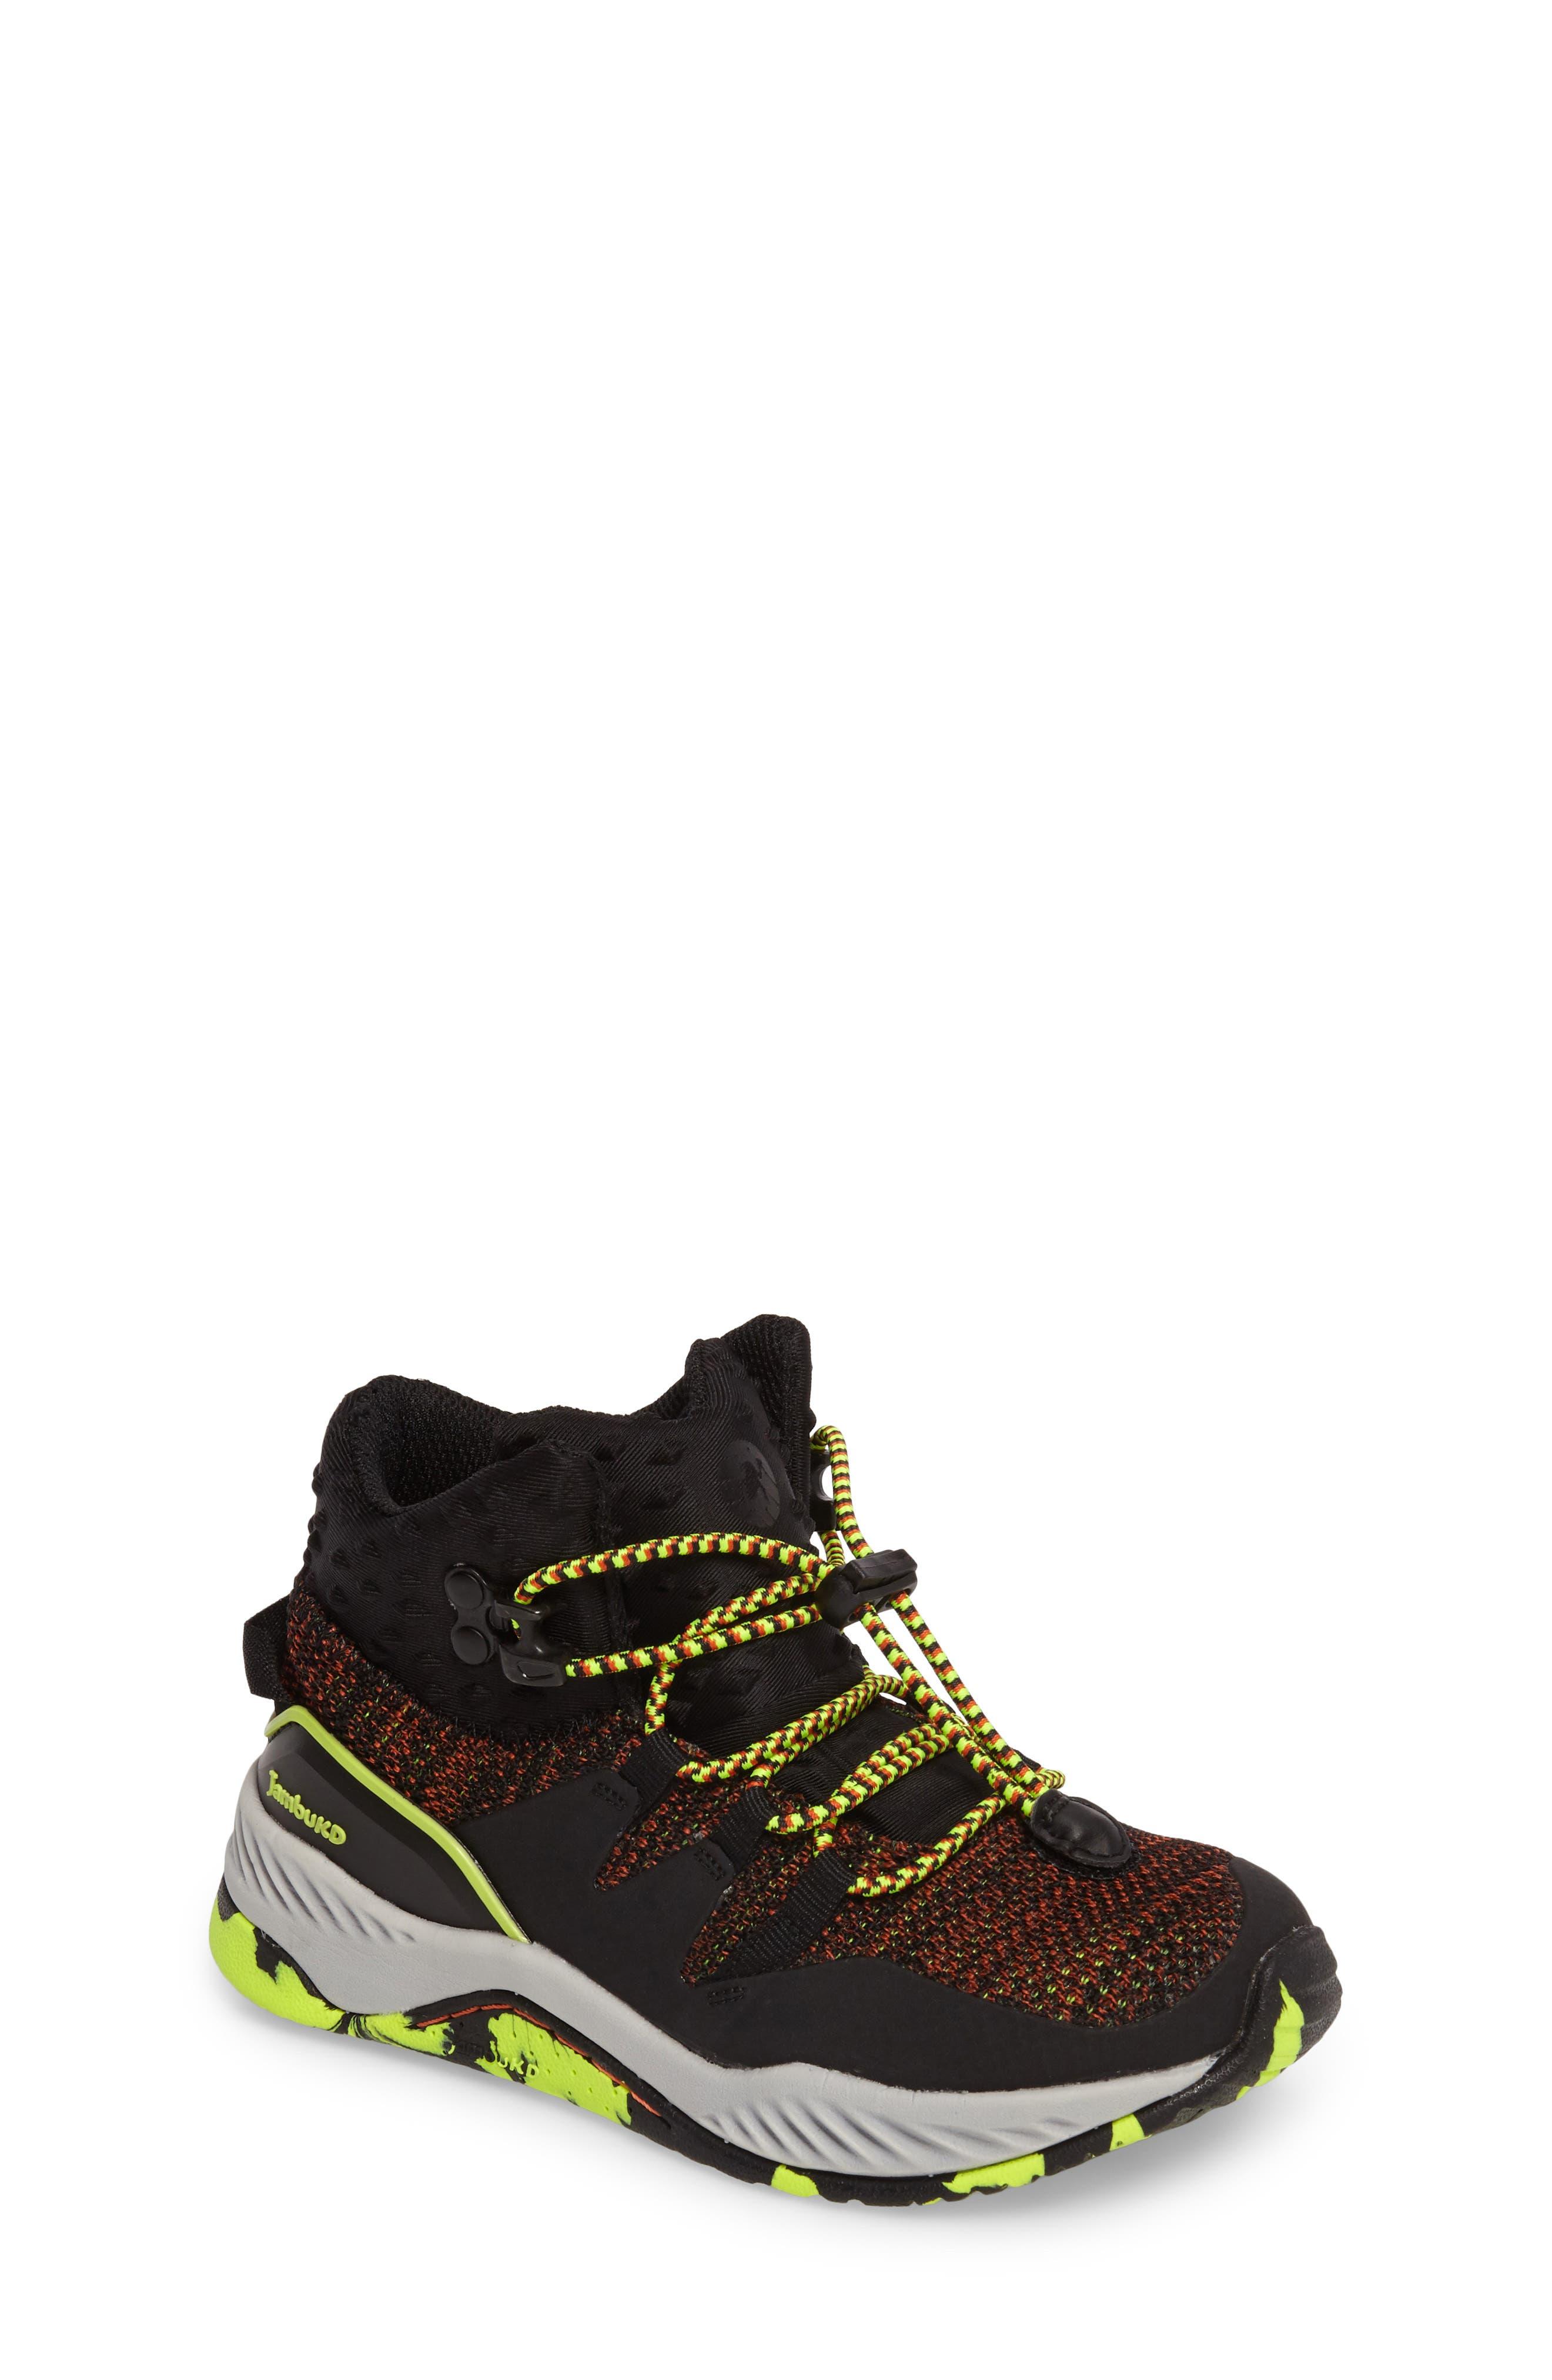 Armadillo Sneaker Boot,                             Main thumbnail 1, color,                             001